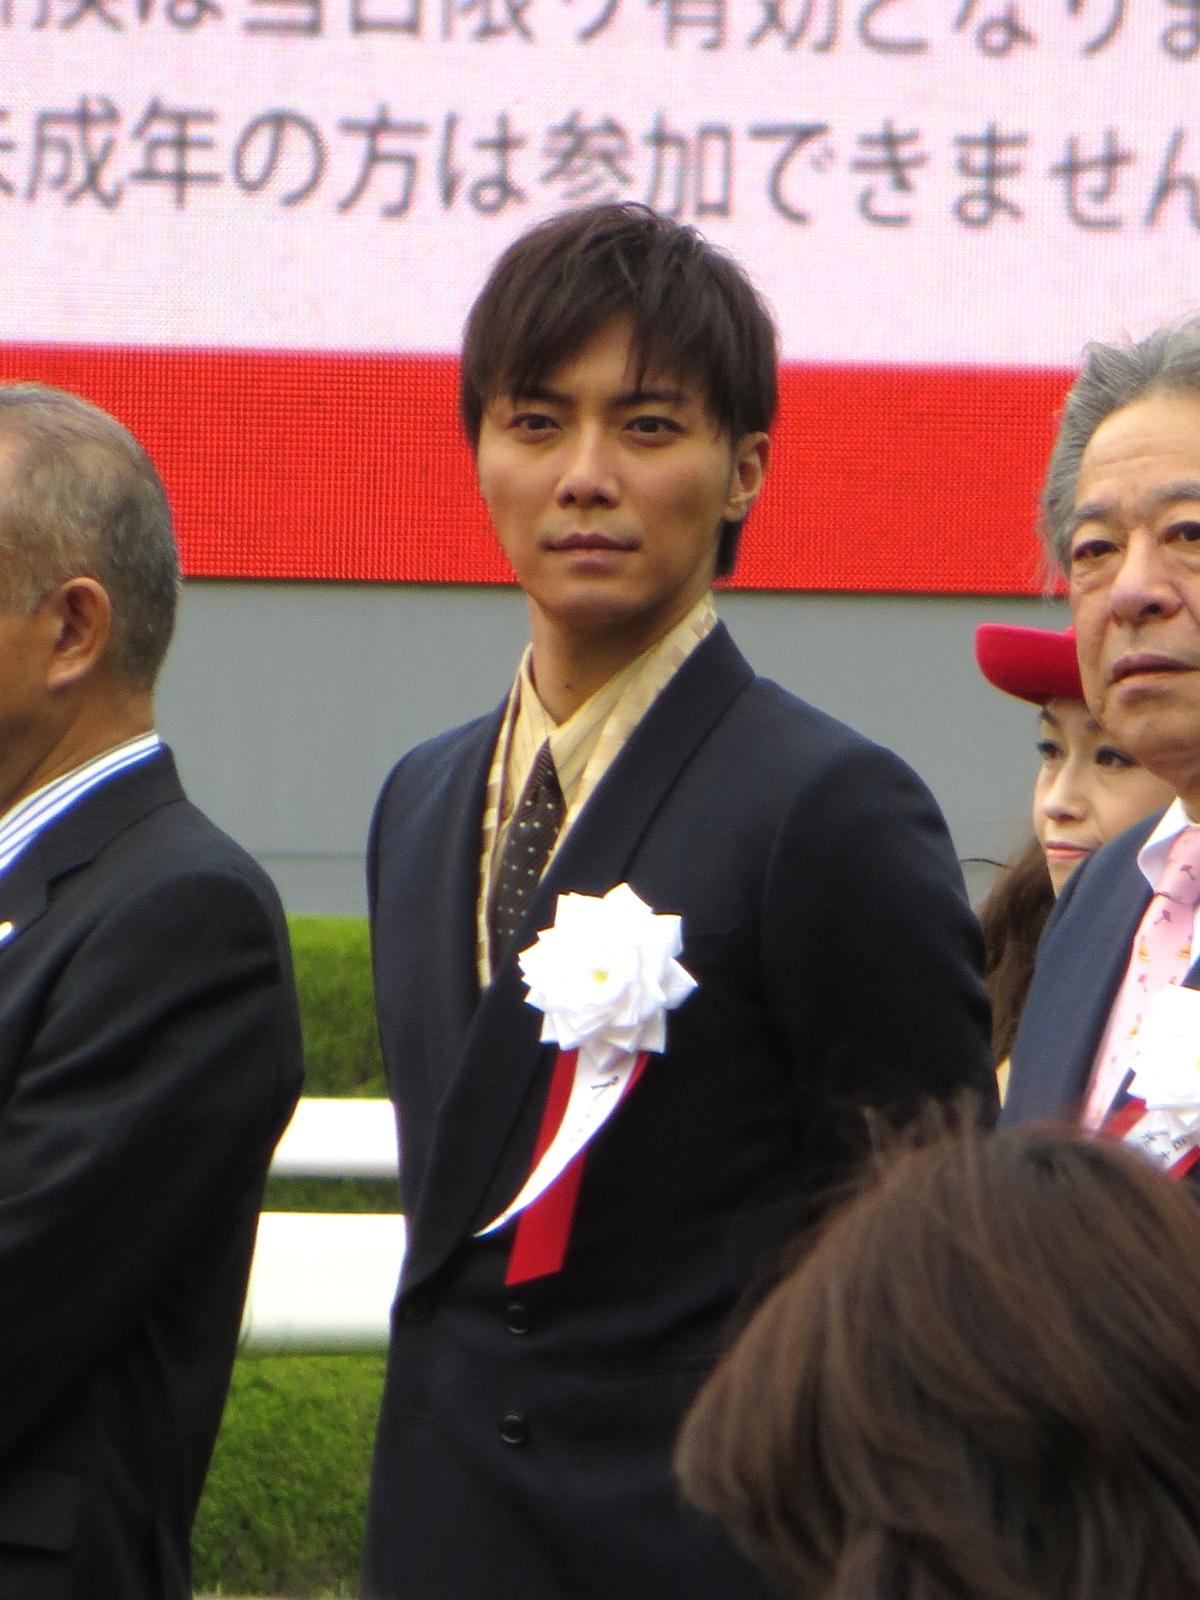 The 35-year old son of father (?) and mother(?) Hiroki Narimiya in 2018 photo. Hiroki Narimiya earned a  million dollar salary - leaving the net worth at 2 million in 2018